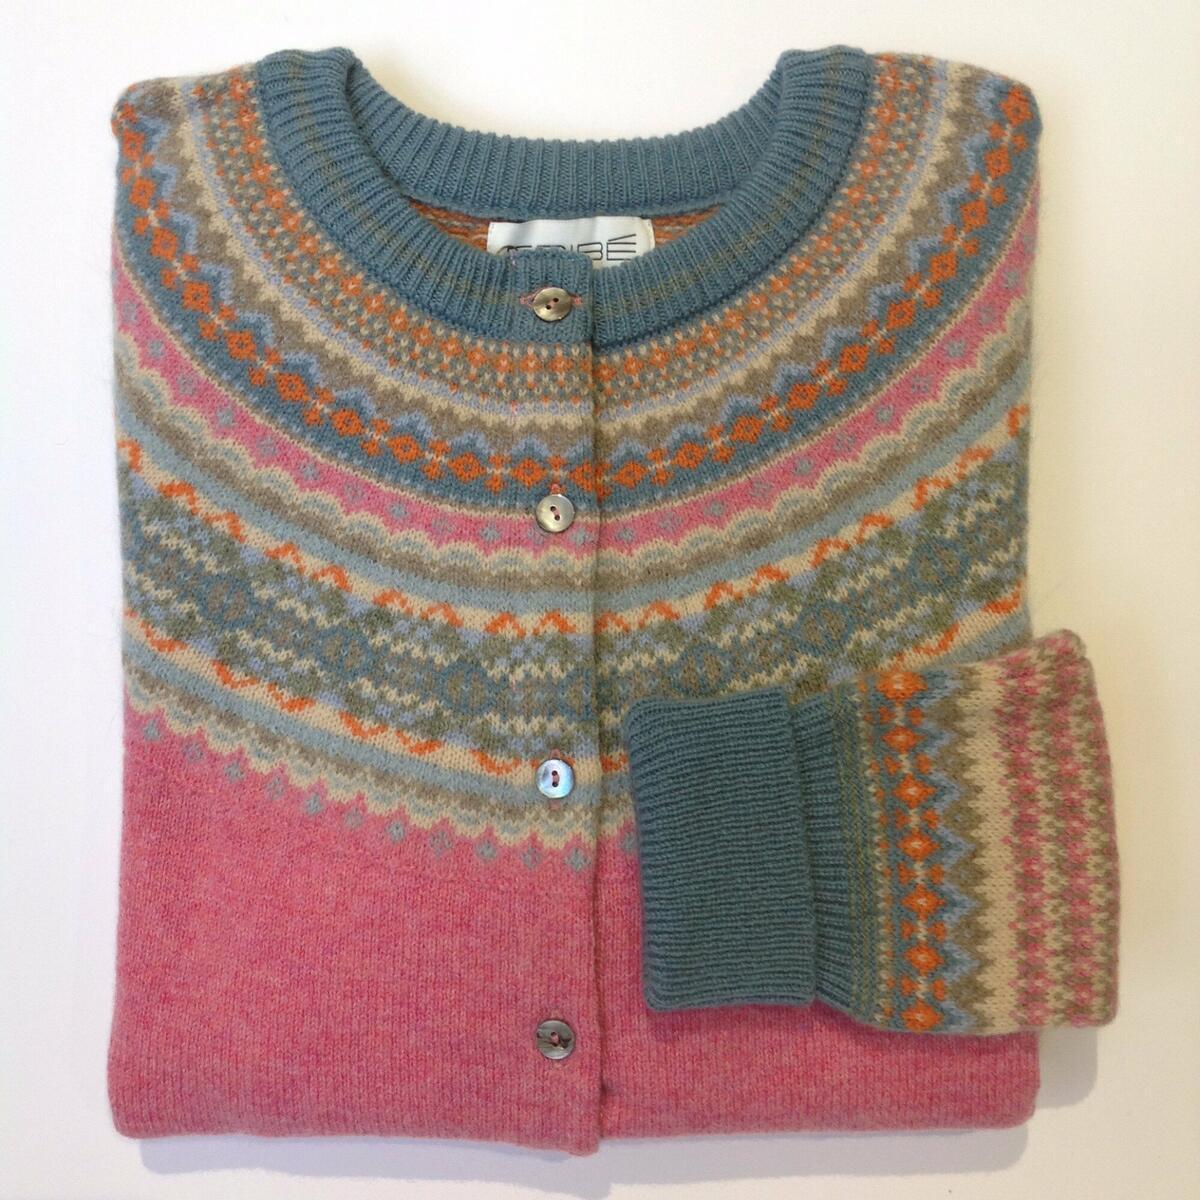 Knitwear in many designs & colours